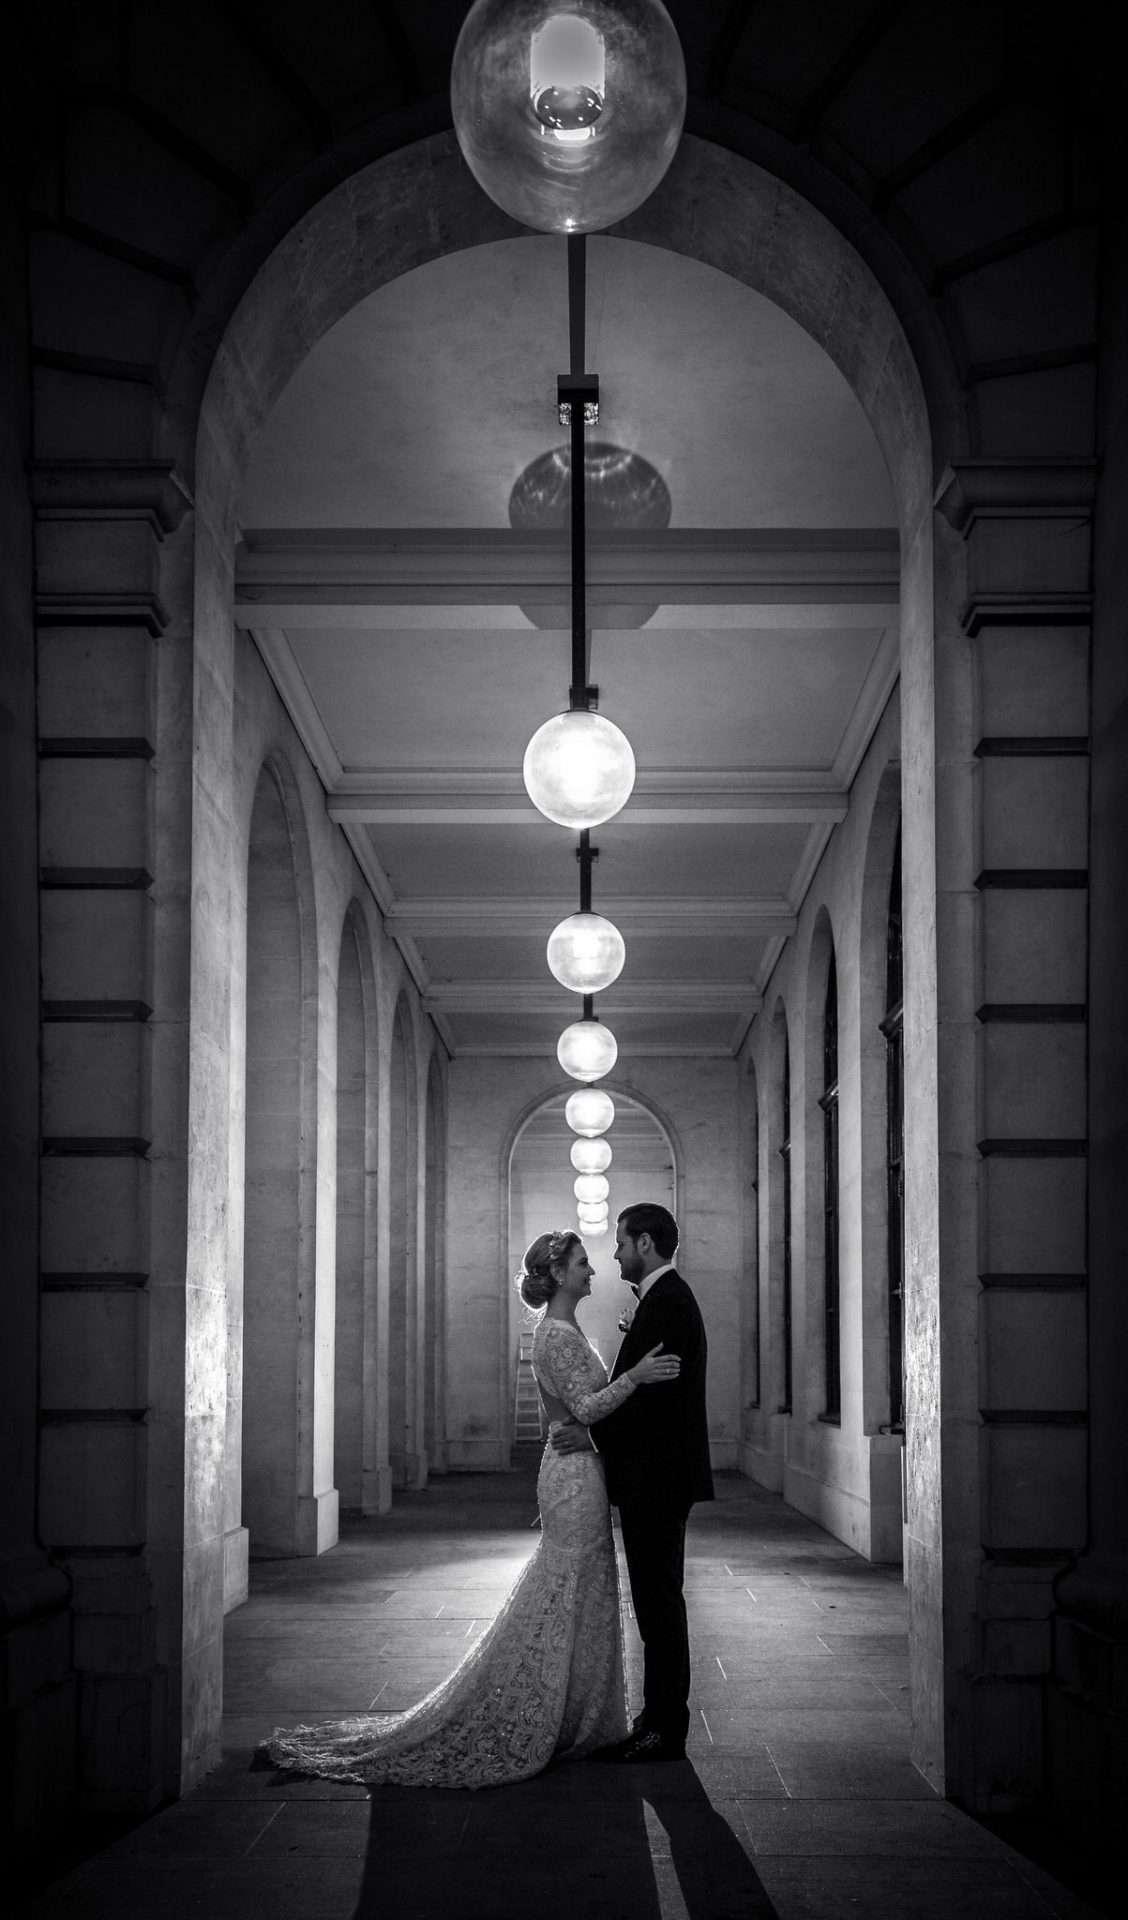 Gibson-hall wedding-photography-Chris-Woodman-photography-05